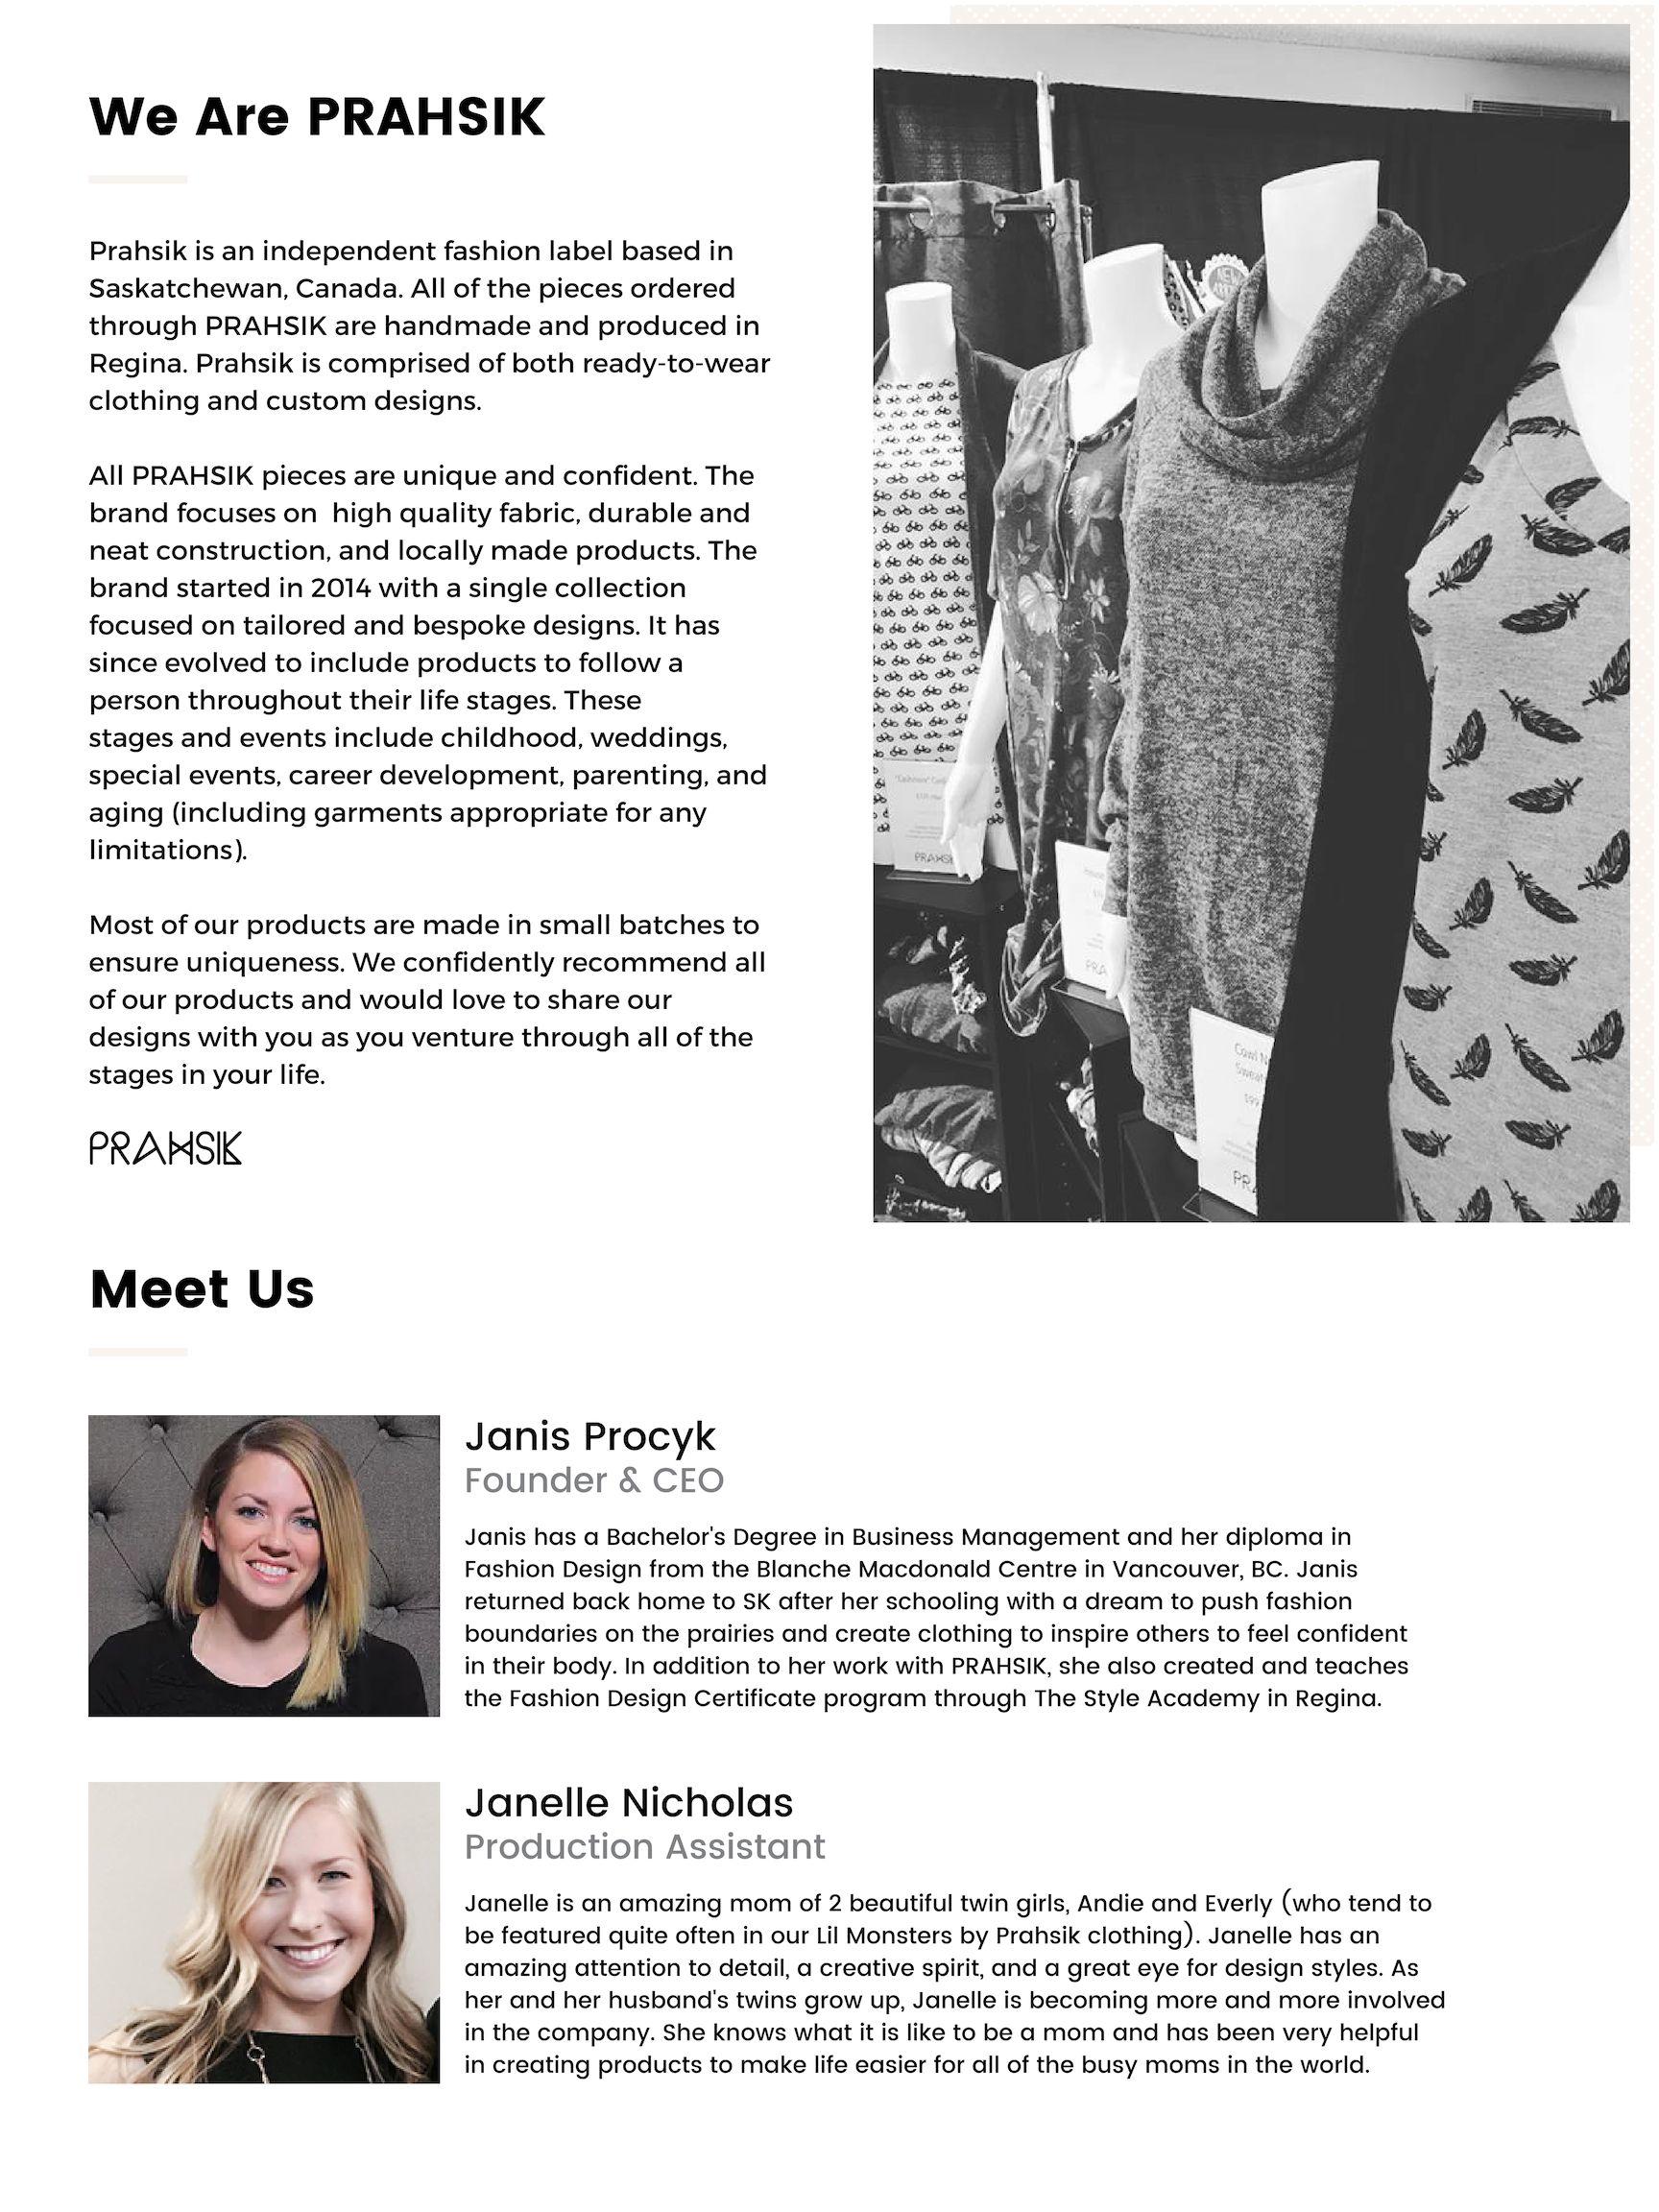 Aurify Brands Careers About Us – Prahsik